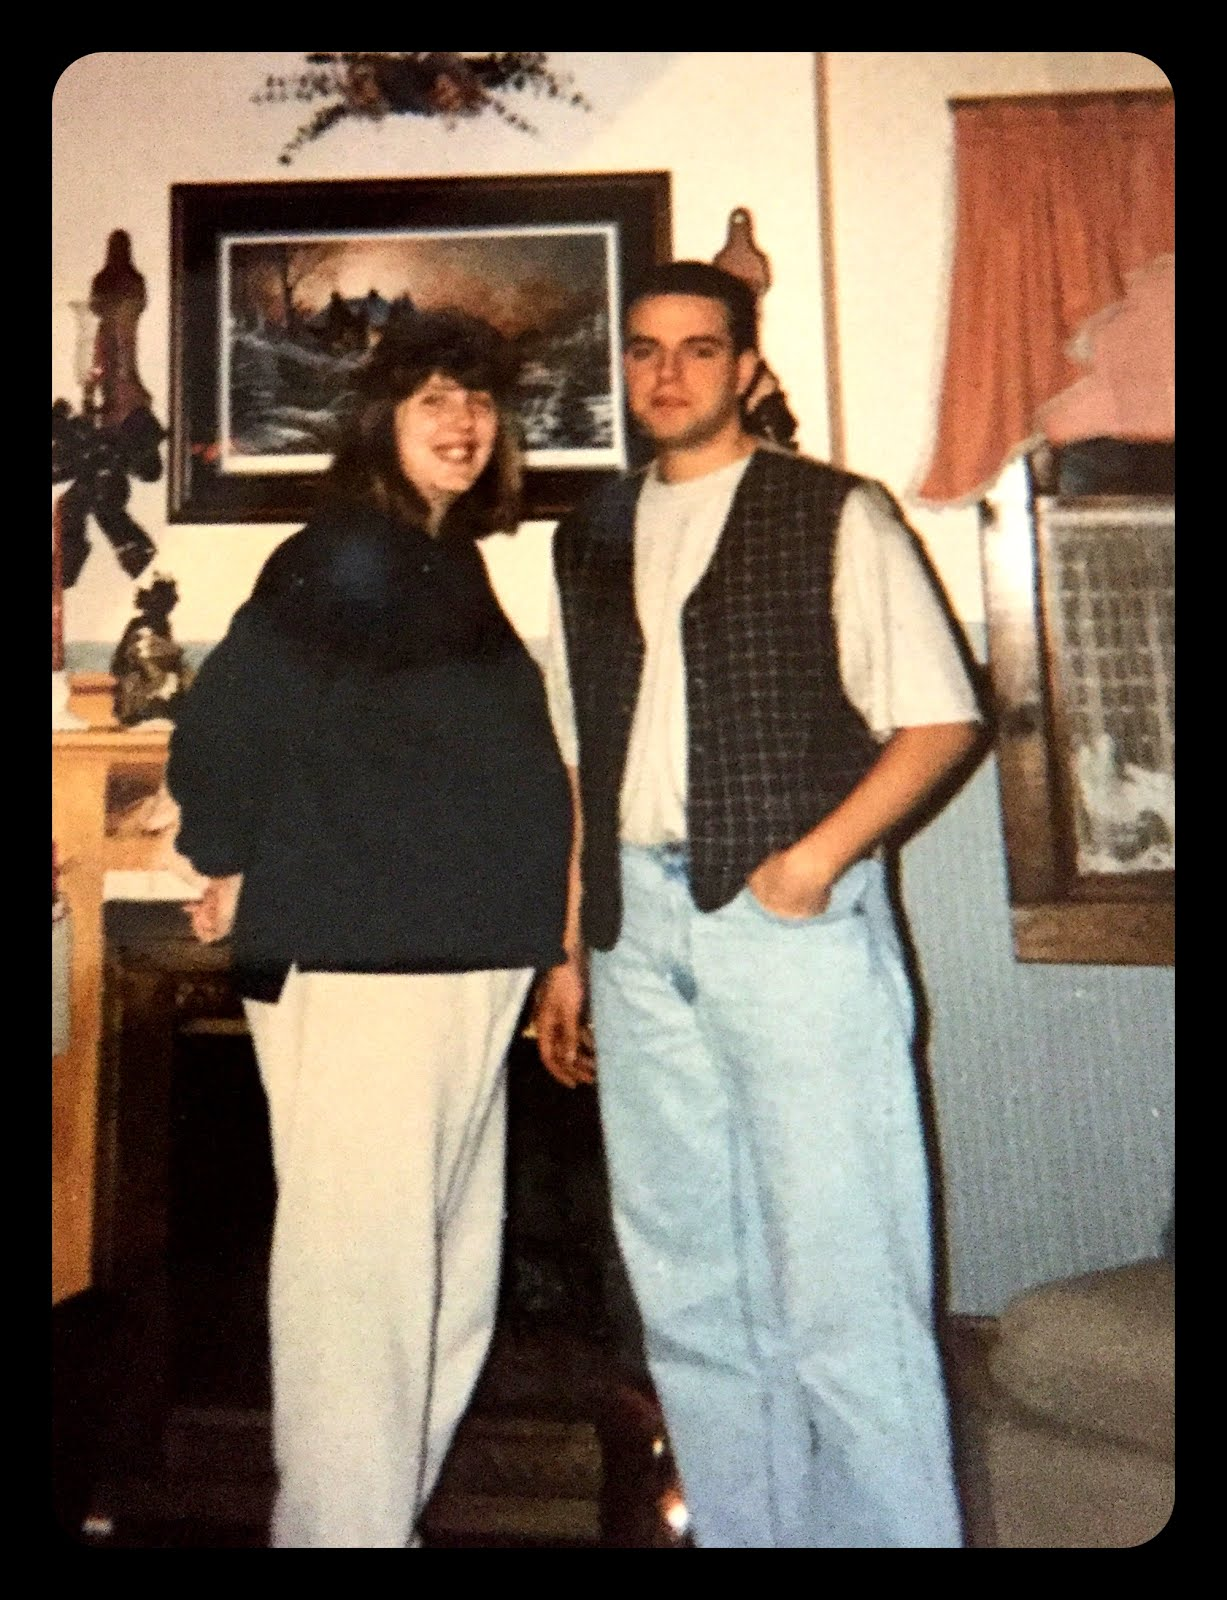 Bruce and Julia